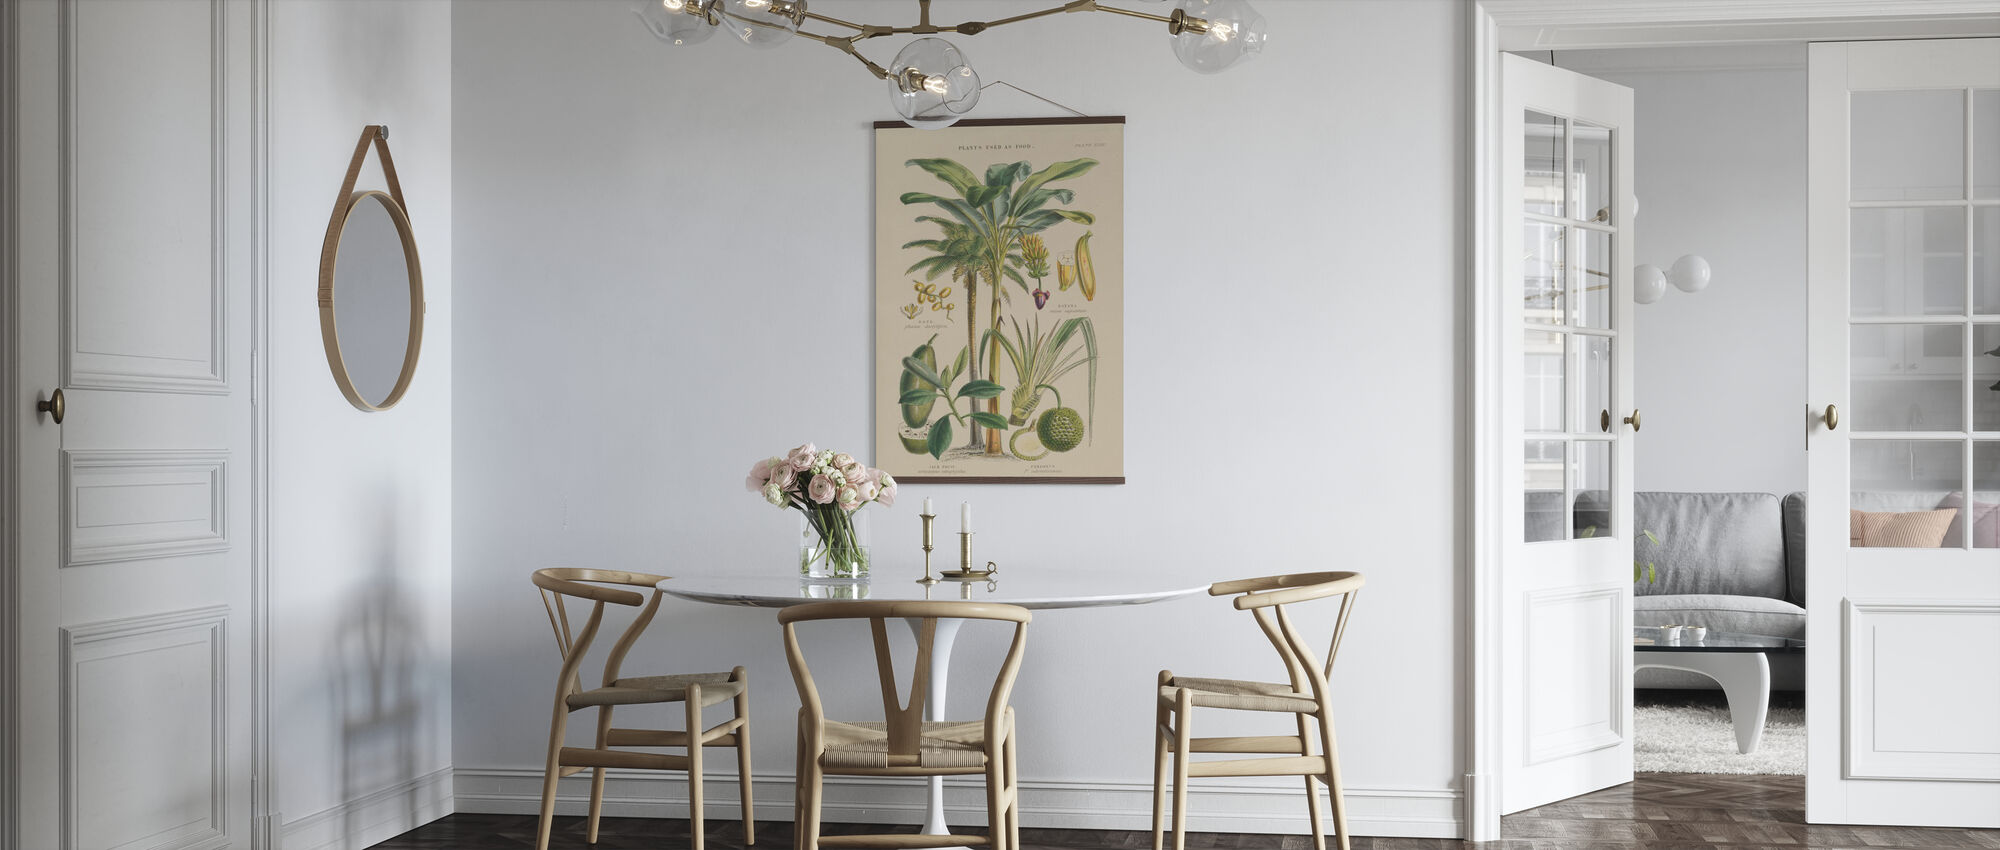 Fruit Trees - Poster - Kitchen